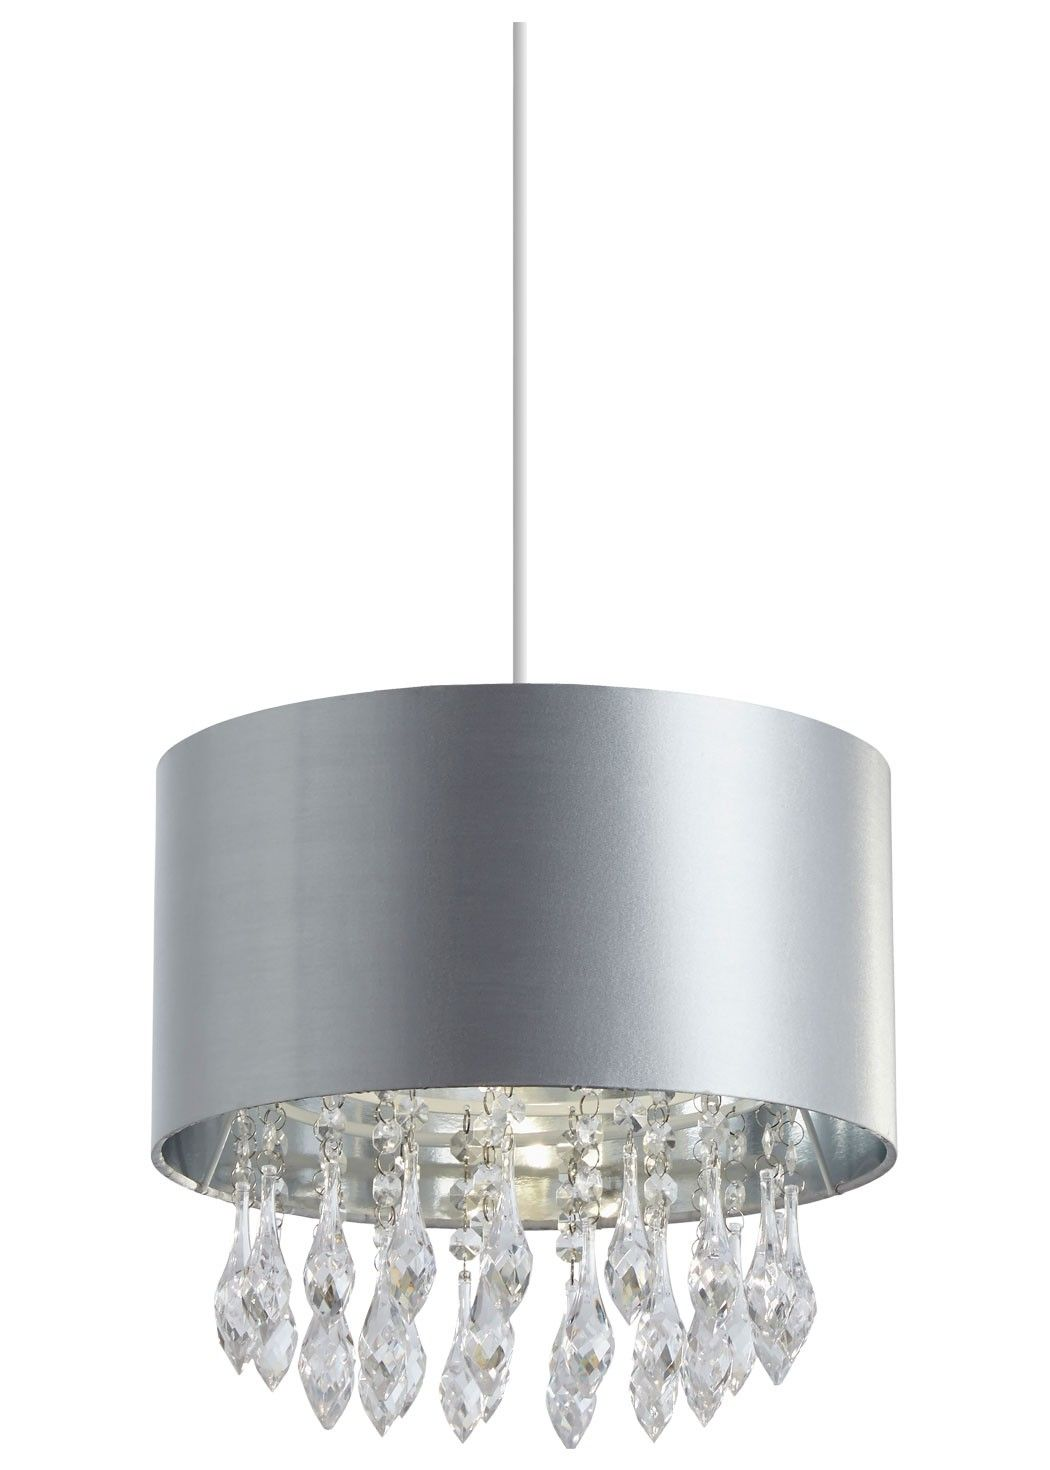 Finn pendant light shade silver pendant lighting silver bedroom finn pendant light shade silver bedroom aloadofball Choice Image